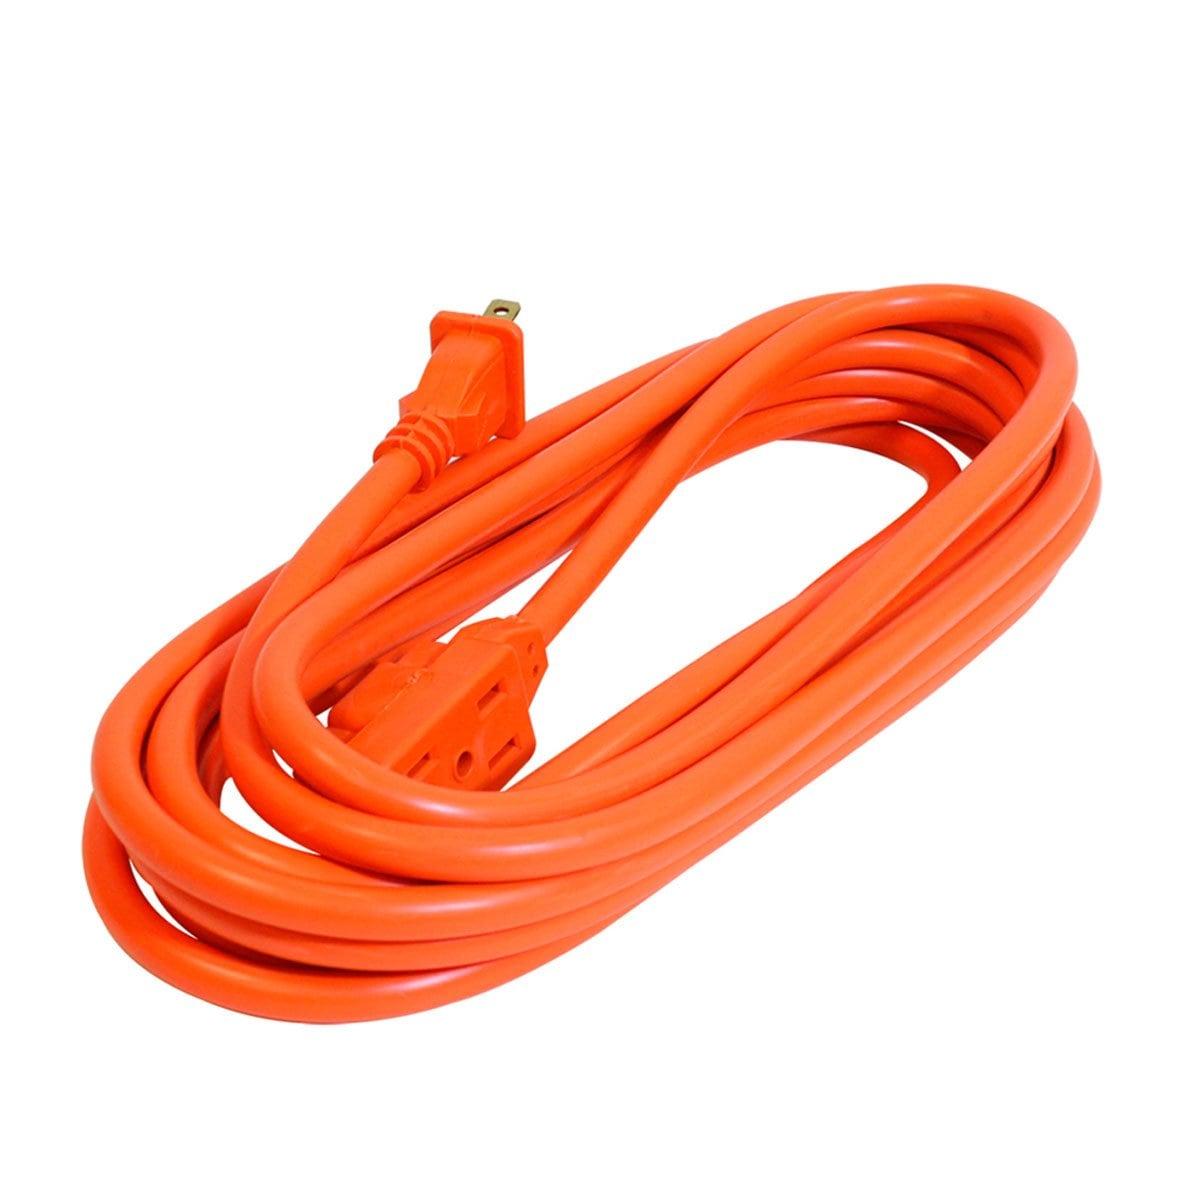 Sanelec 2408 Extensión Uso Rudo 5 M Naranja